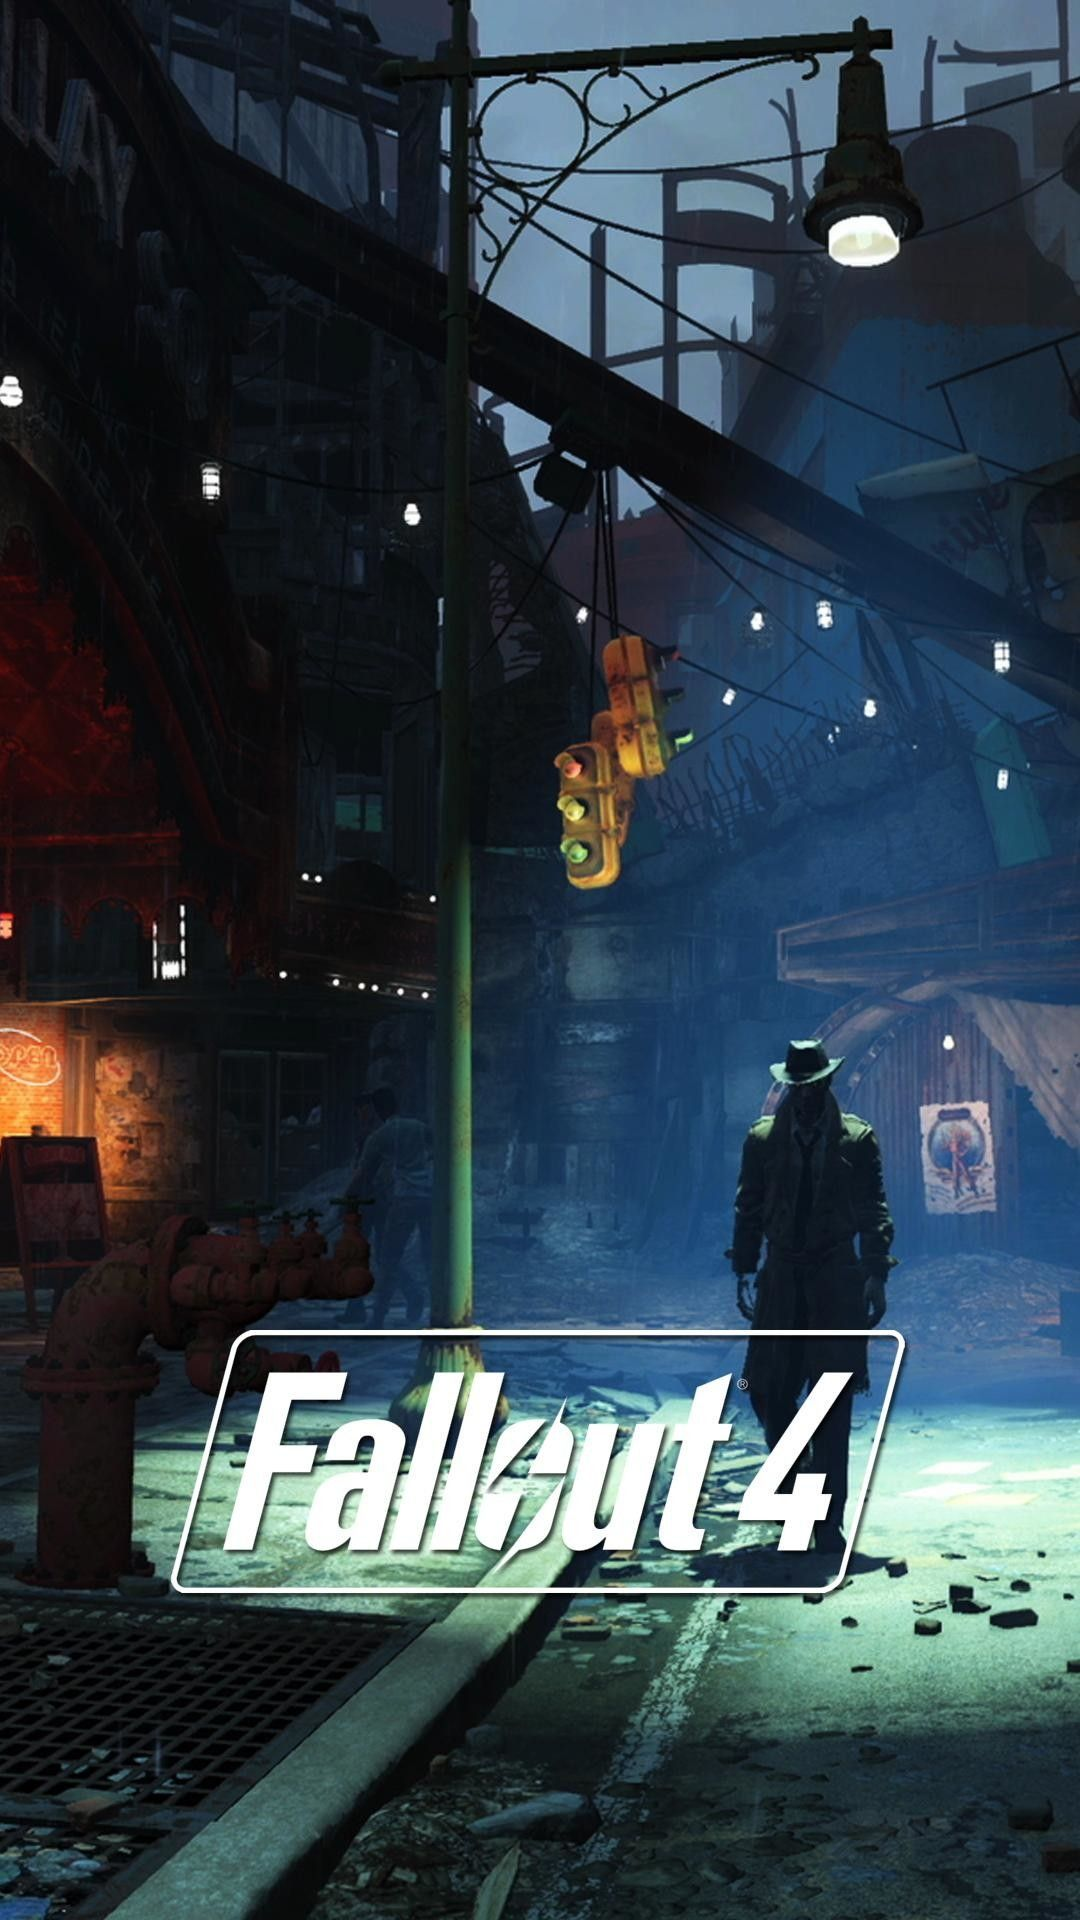 Fallout Phone HD Wallpapers - Wallpaper ...